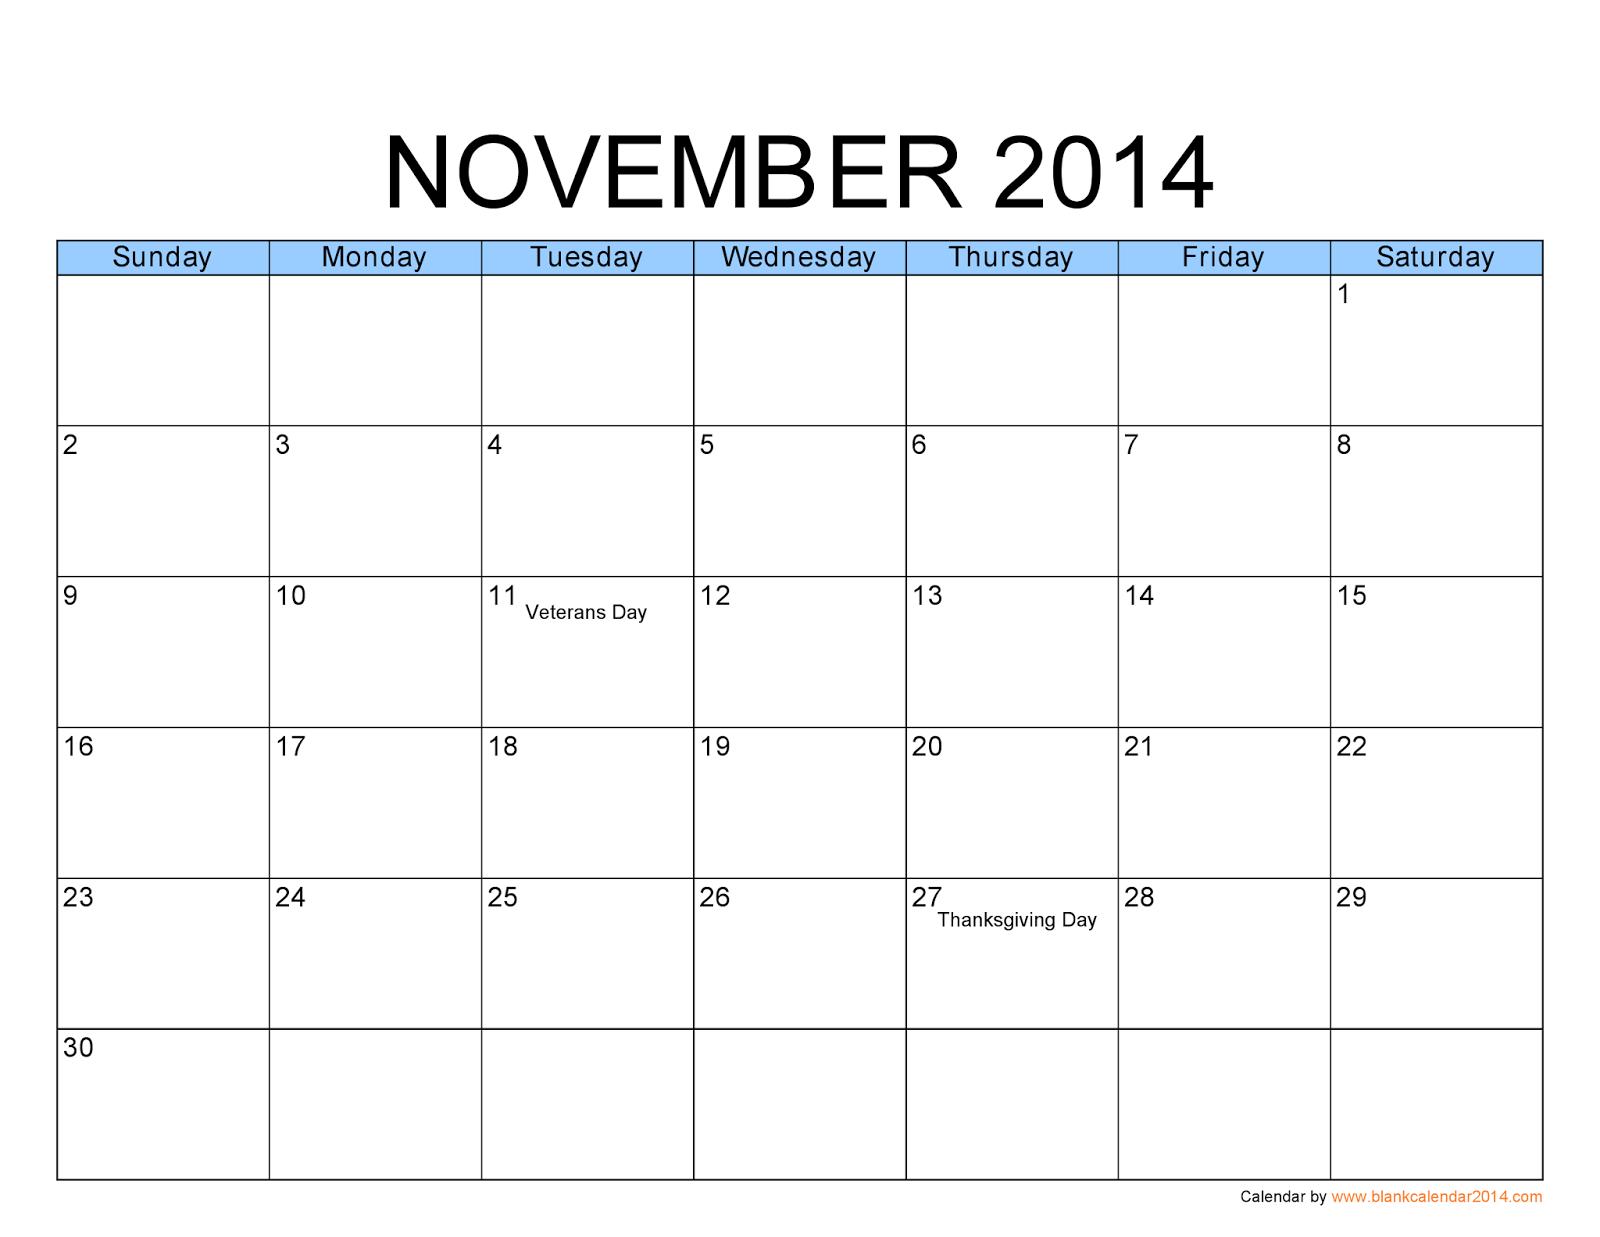 November 2014 i dont remember the date lol